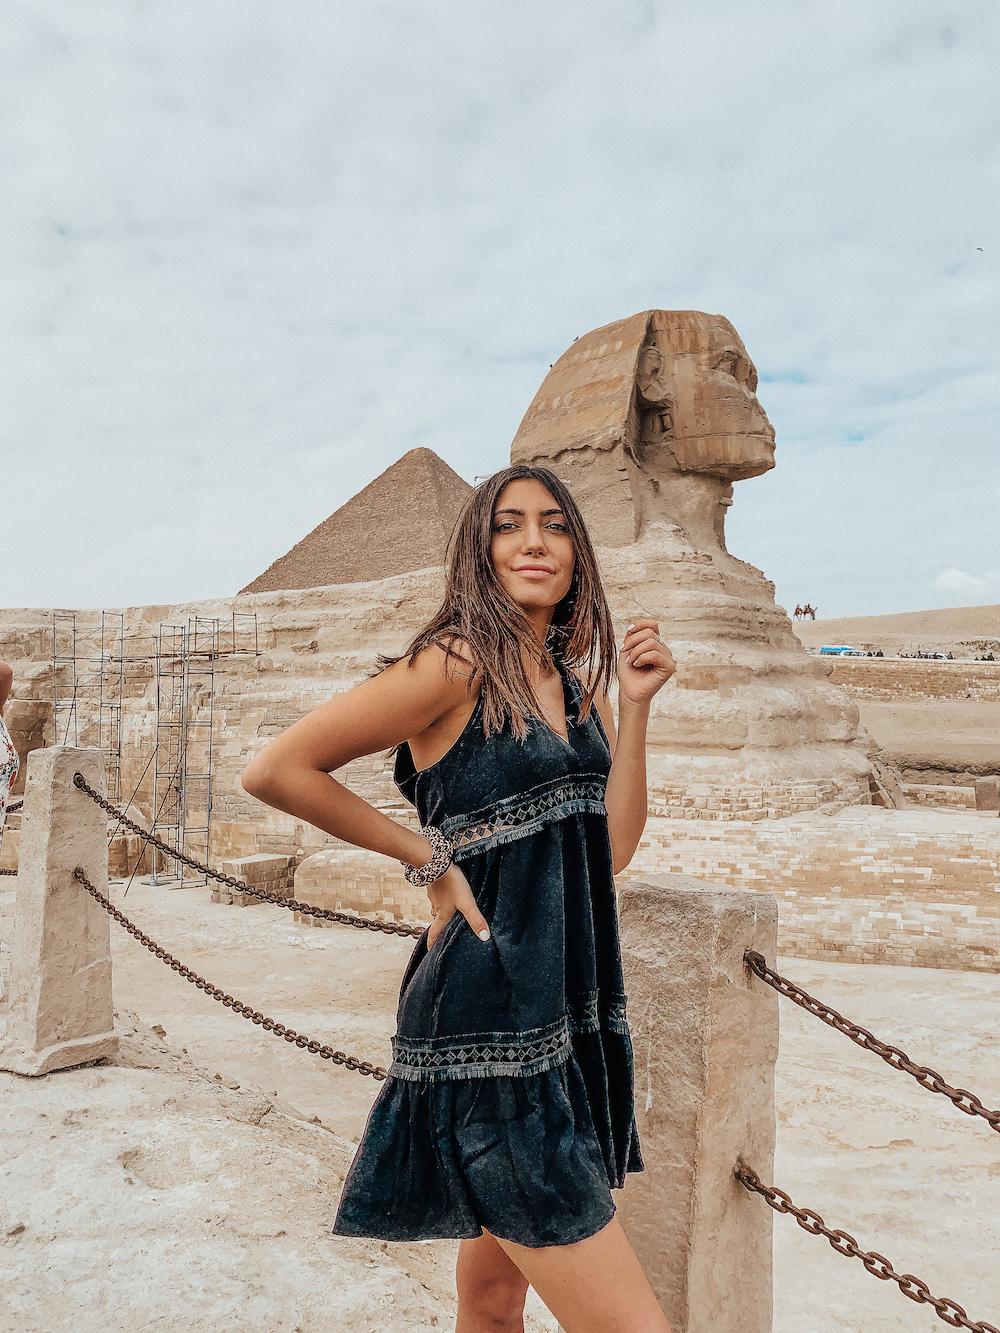 The Sphinx TARA MICHELLE